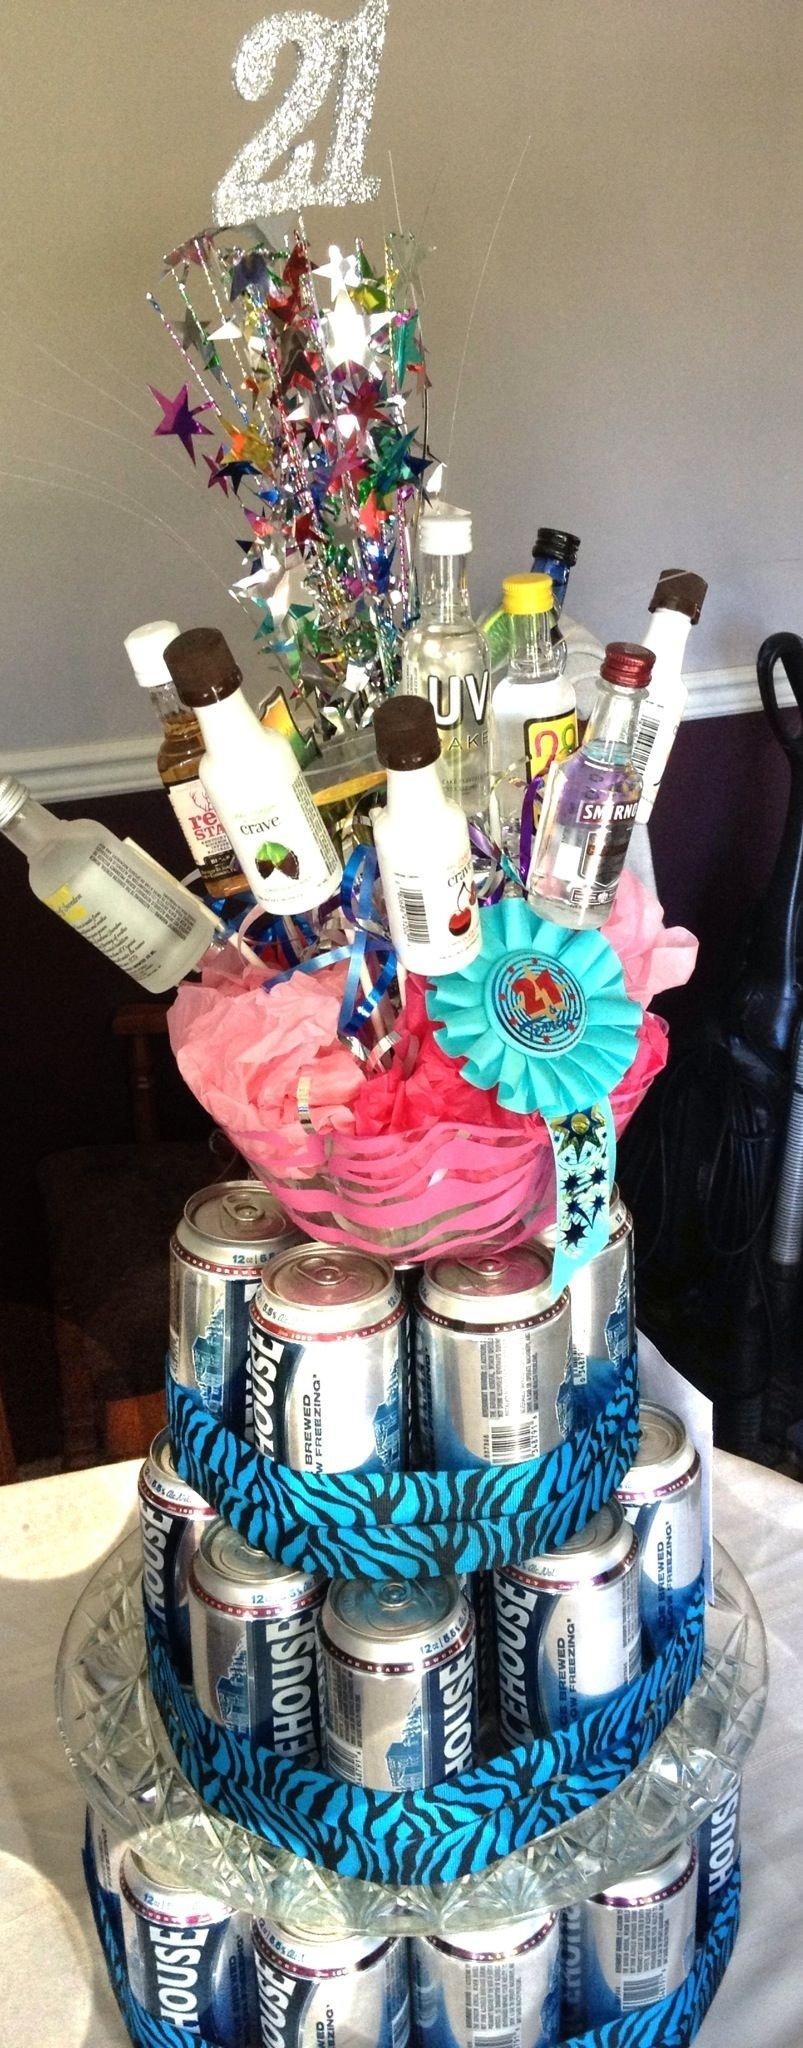 10 Stylish Creative 21St Birthday Gift Ideas 21st Idea Easy And 21 Bday